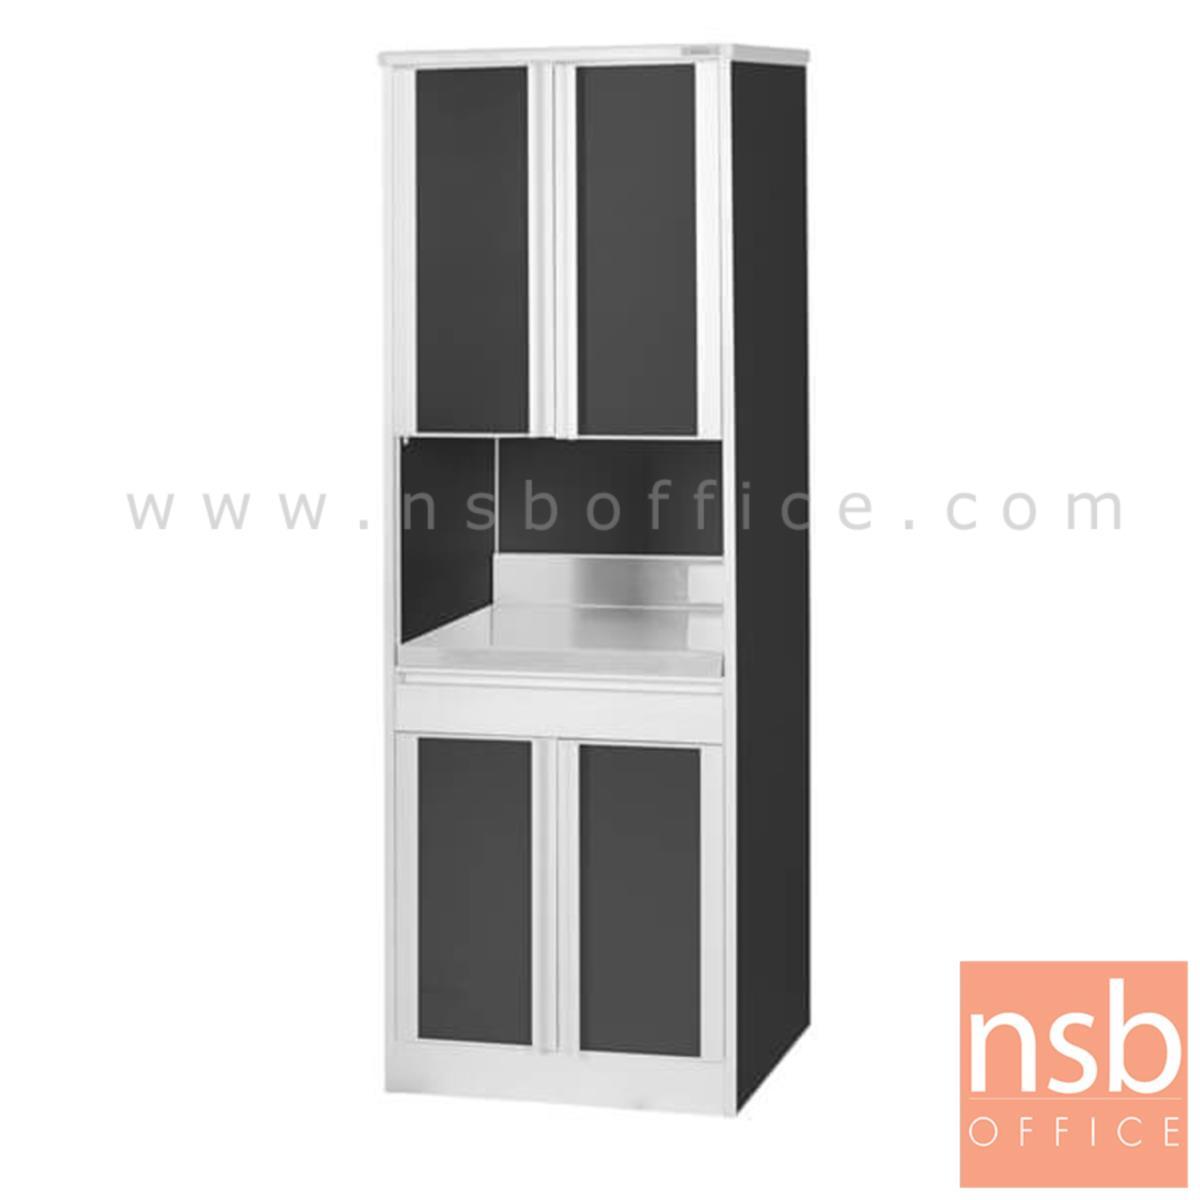 K09A032:ตู้ครัวไมโครเวฟ รุ่น MCB-AC 4 บานเปิด